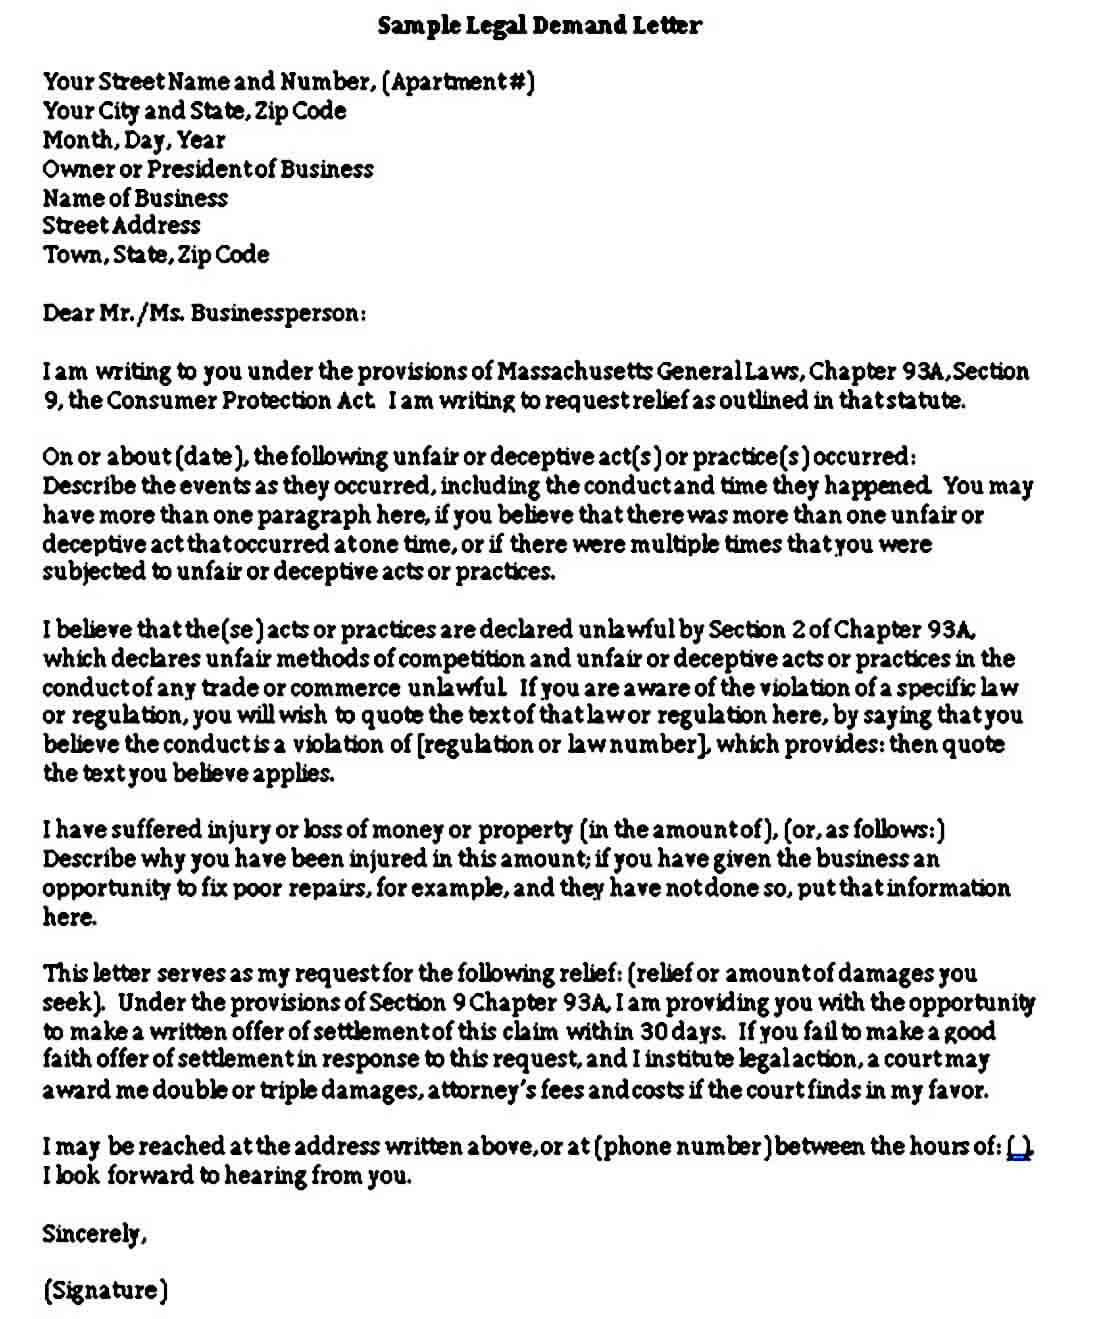 Sample Legal Demand Letter